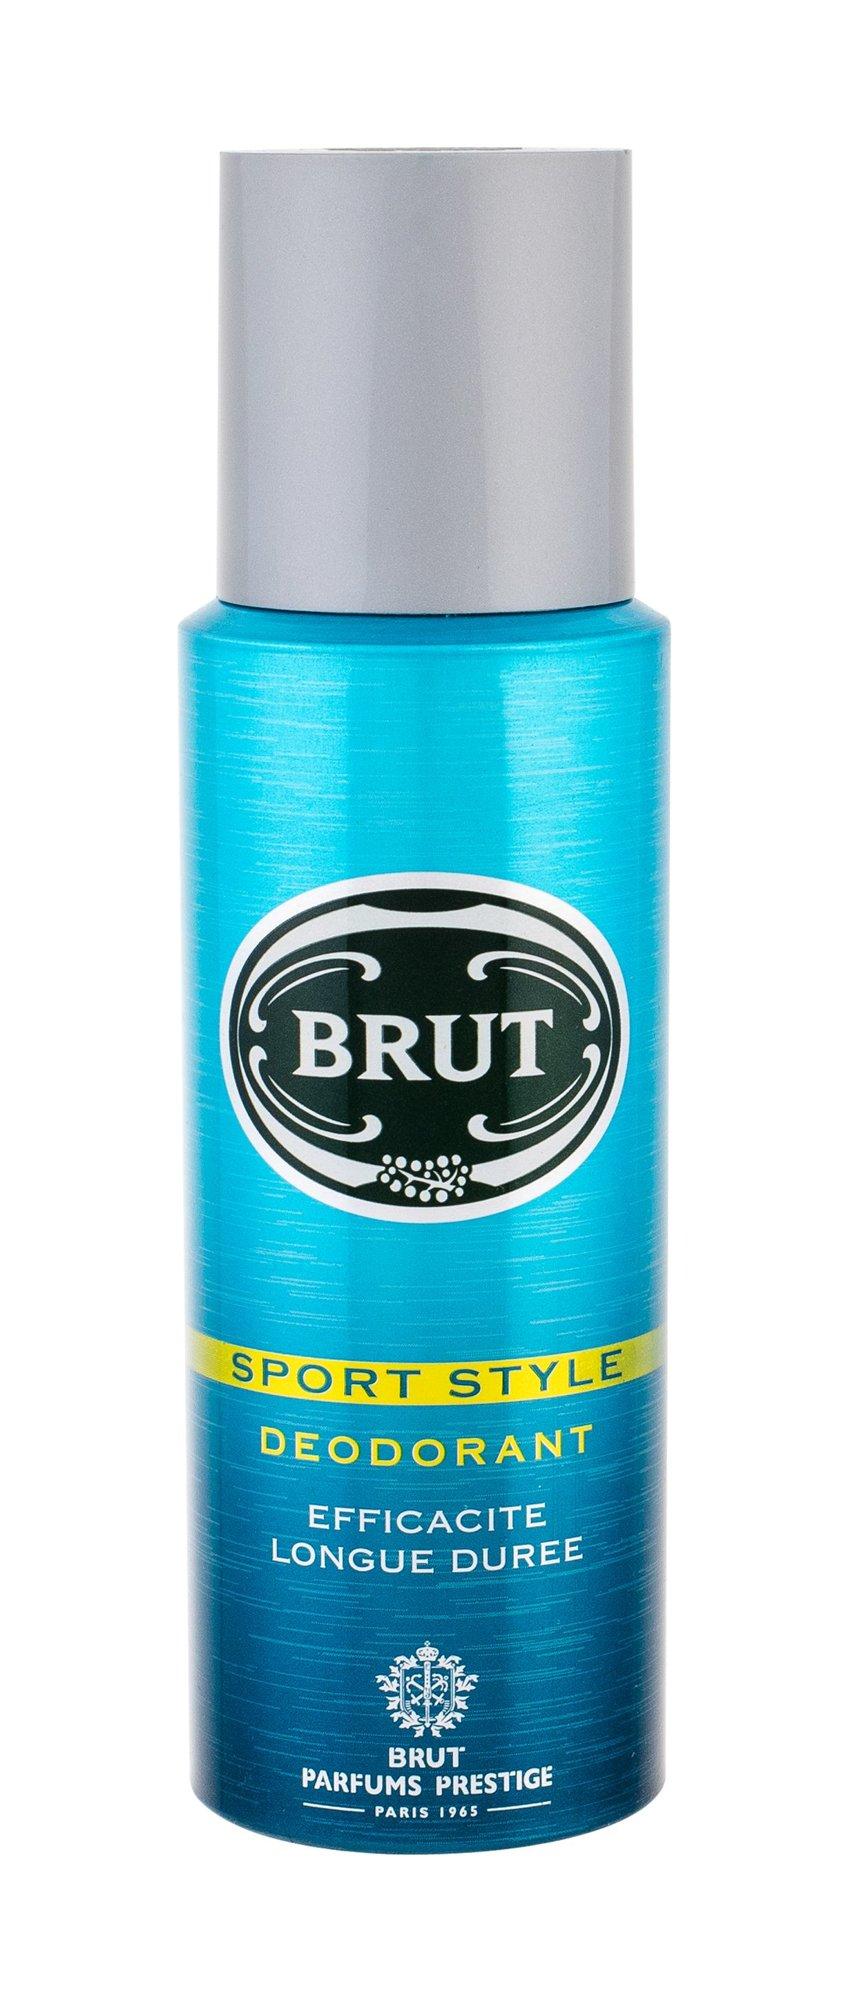 Brut Sport Style Deodorant 200ml